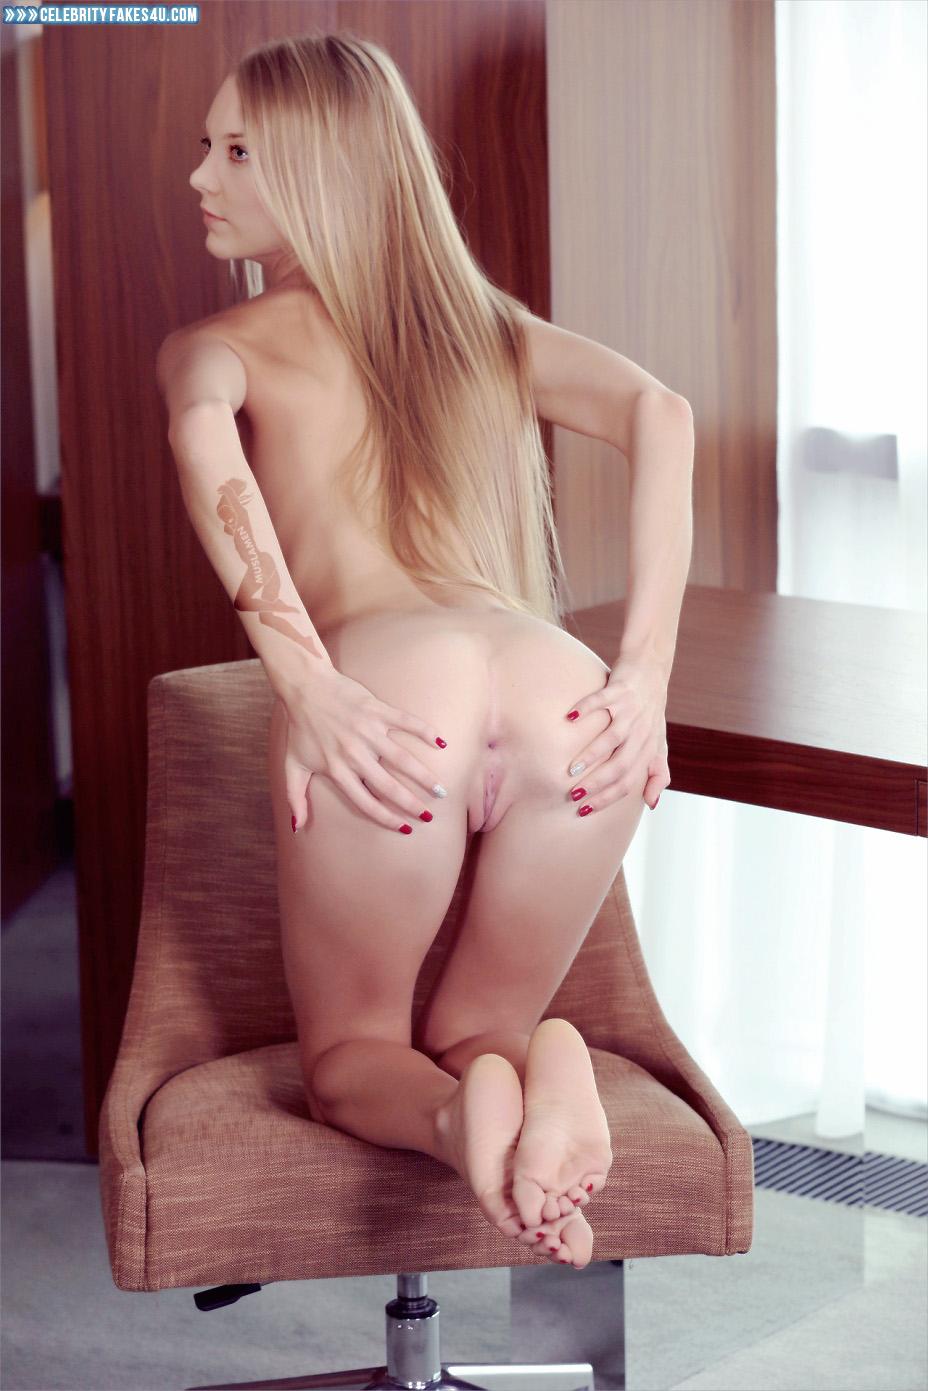 Natalie Dormer Fake, , Porn